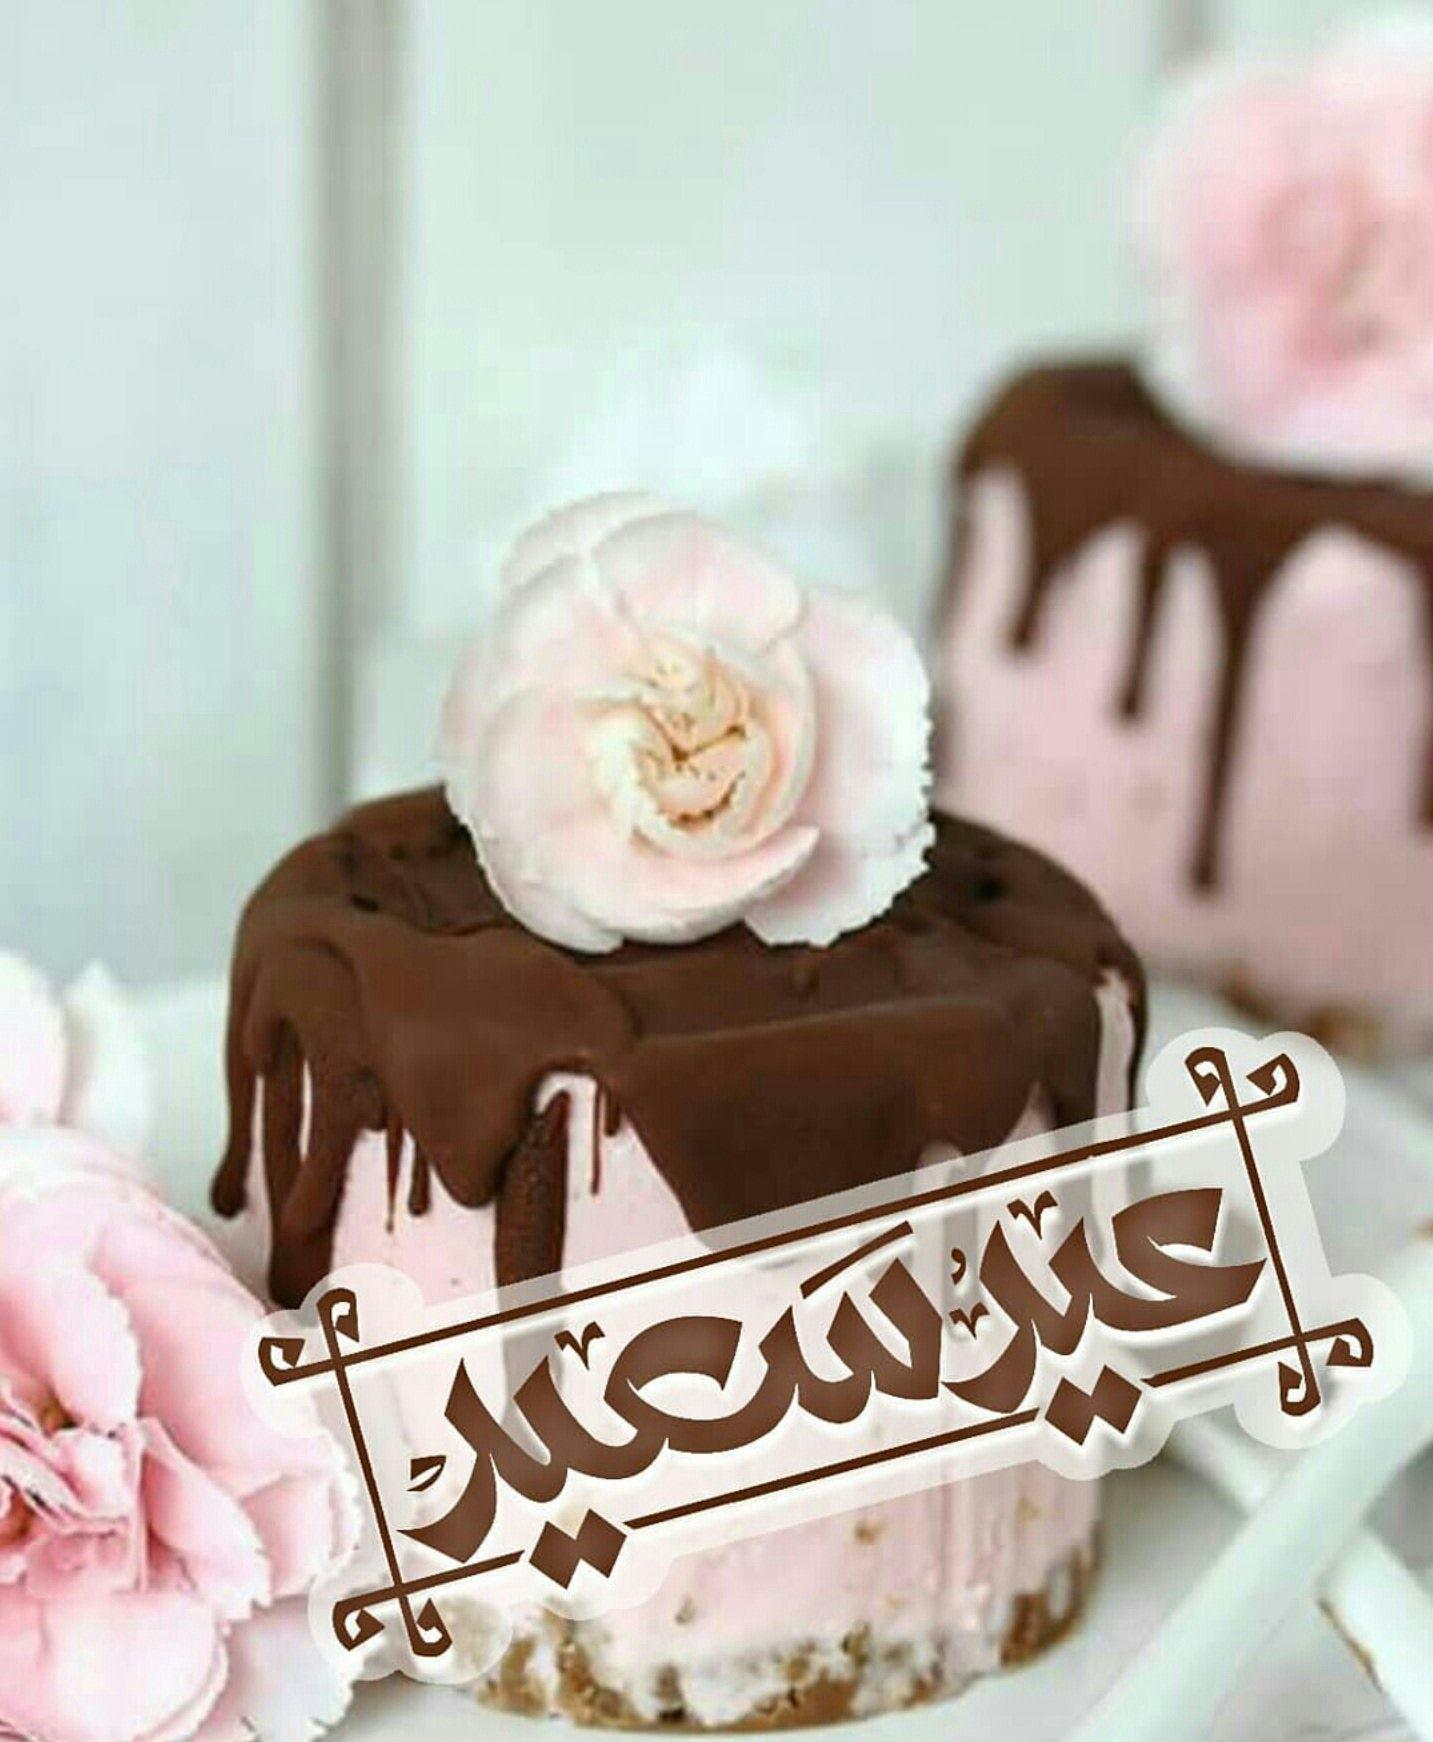 Pin By Bleedingheartrose Light On عيد الفطر عيد الأضحى Eid Mubark Good Morning Msg Eid Mubarak Morning Msg